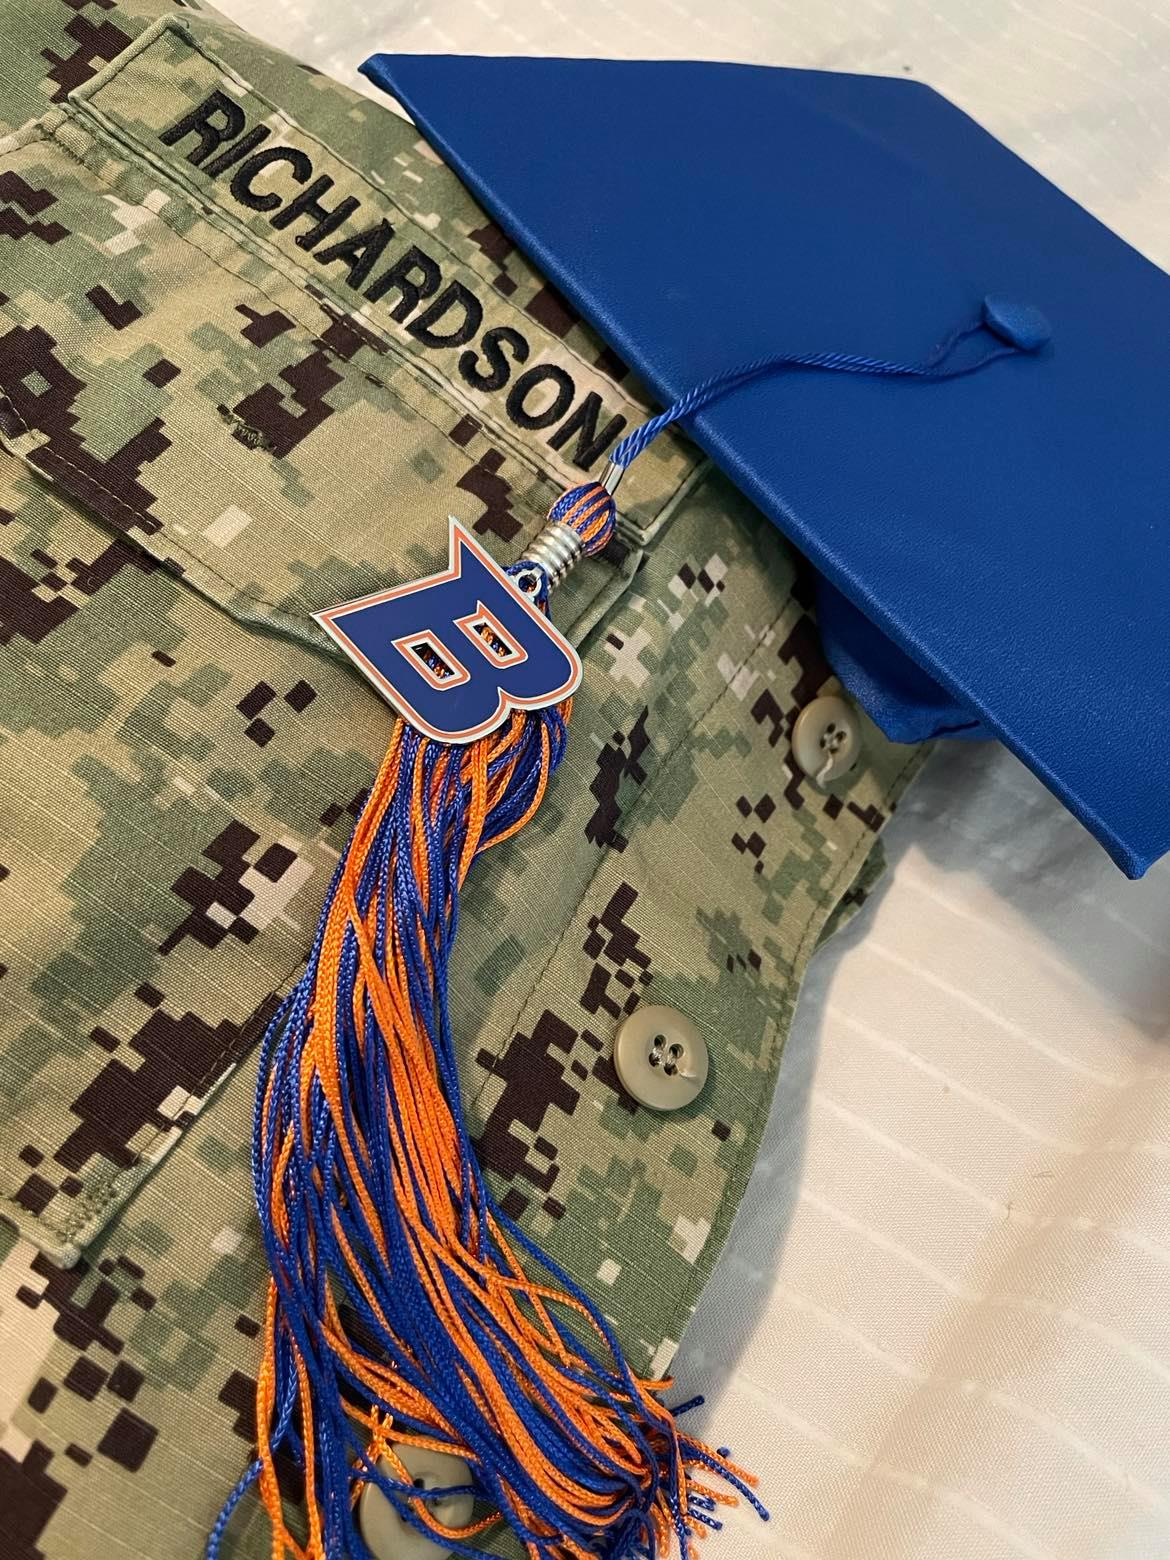 Austin Richardson's Naval uniform is pictured with his Boise State graduation cap.